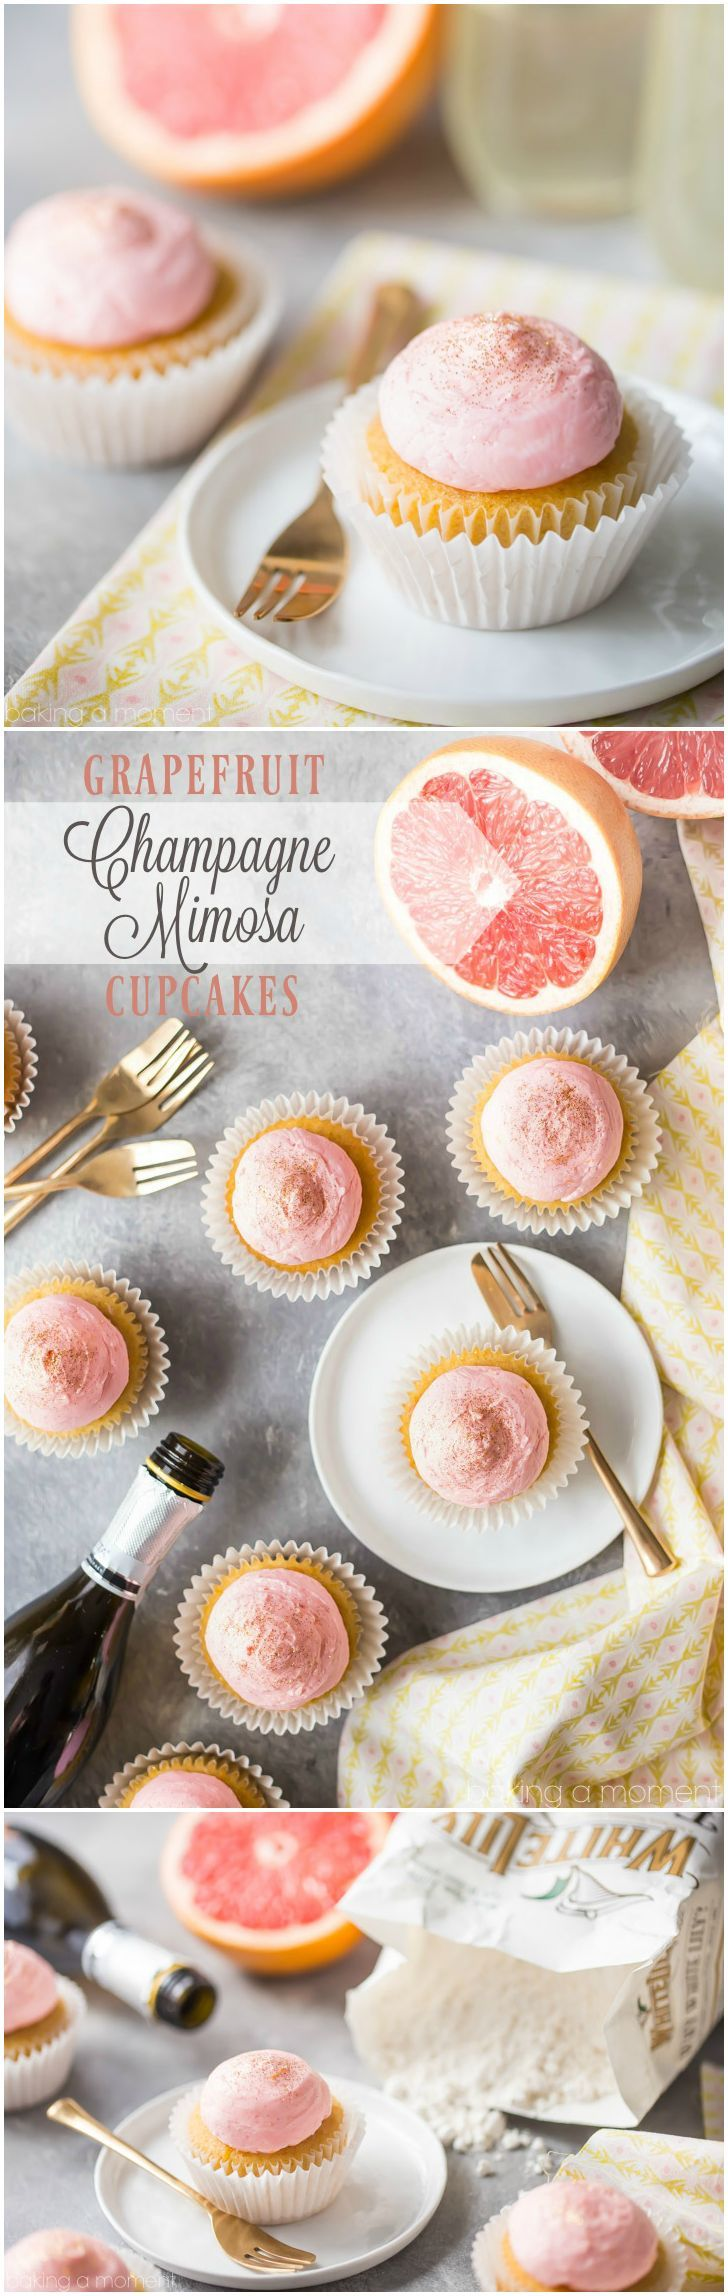 best 25 wine cupcakes ideas on pinterest alcoholic cupcakes